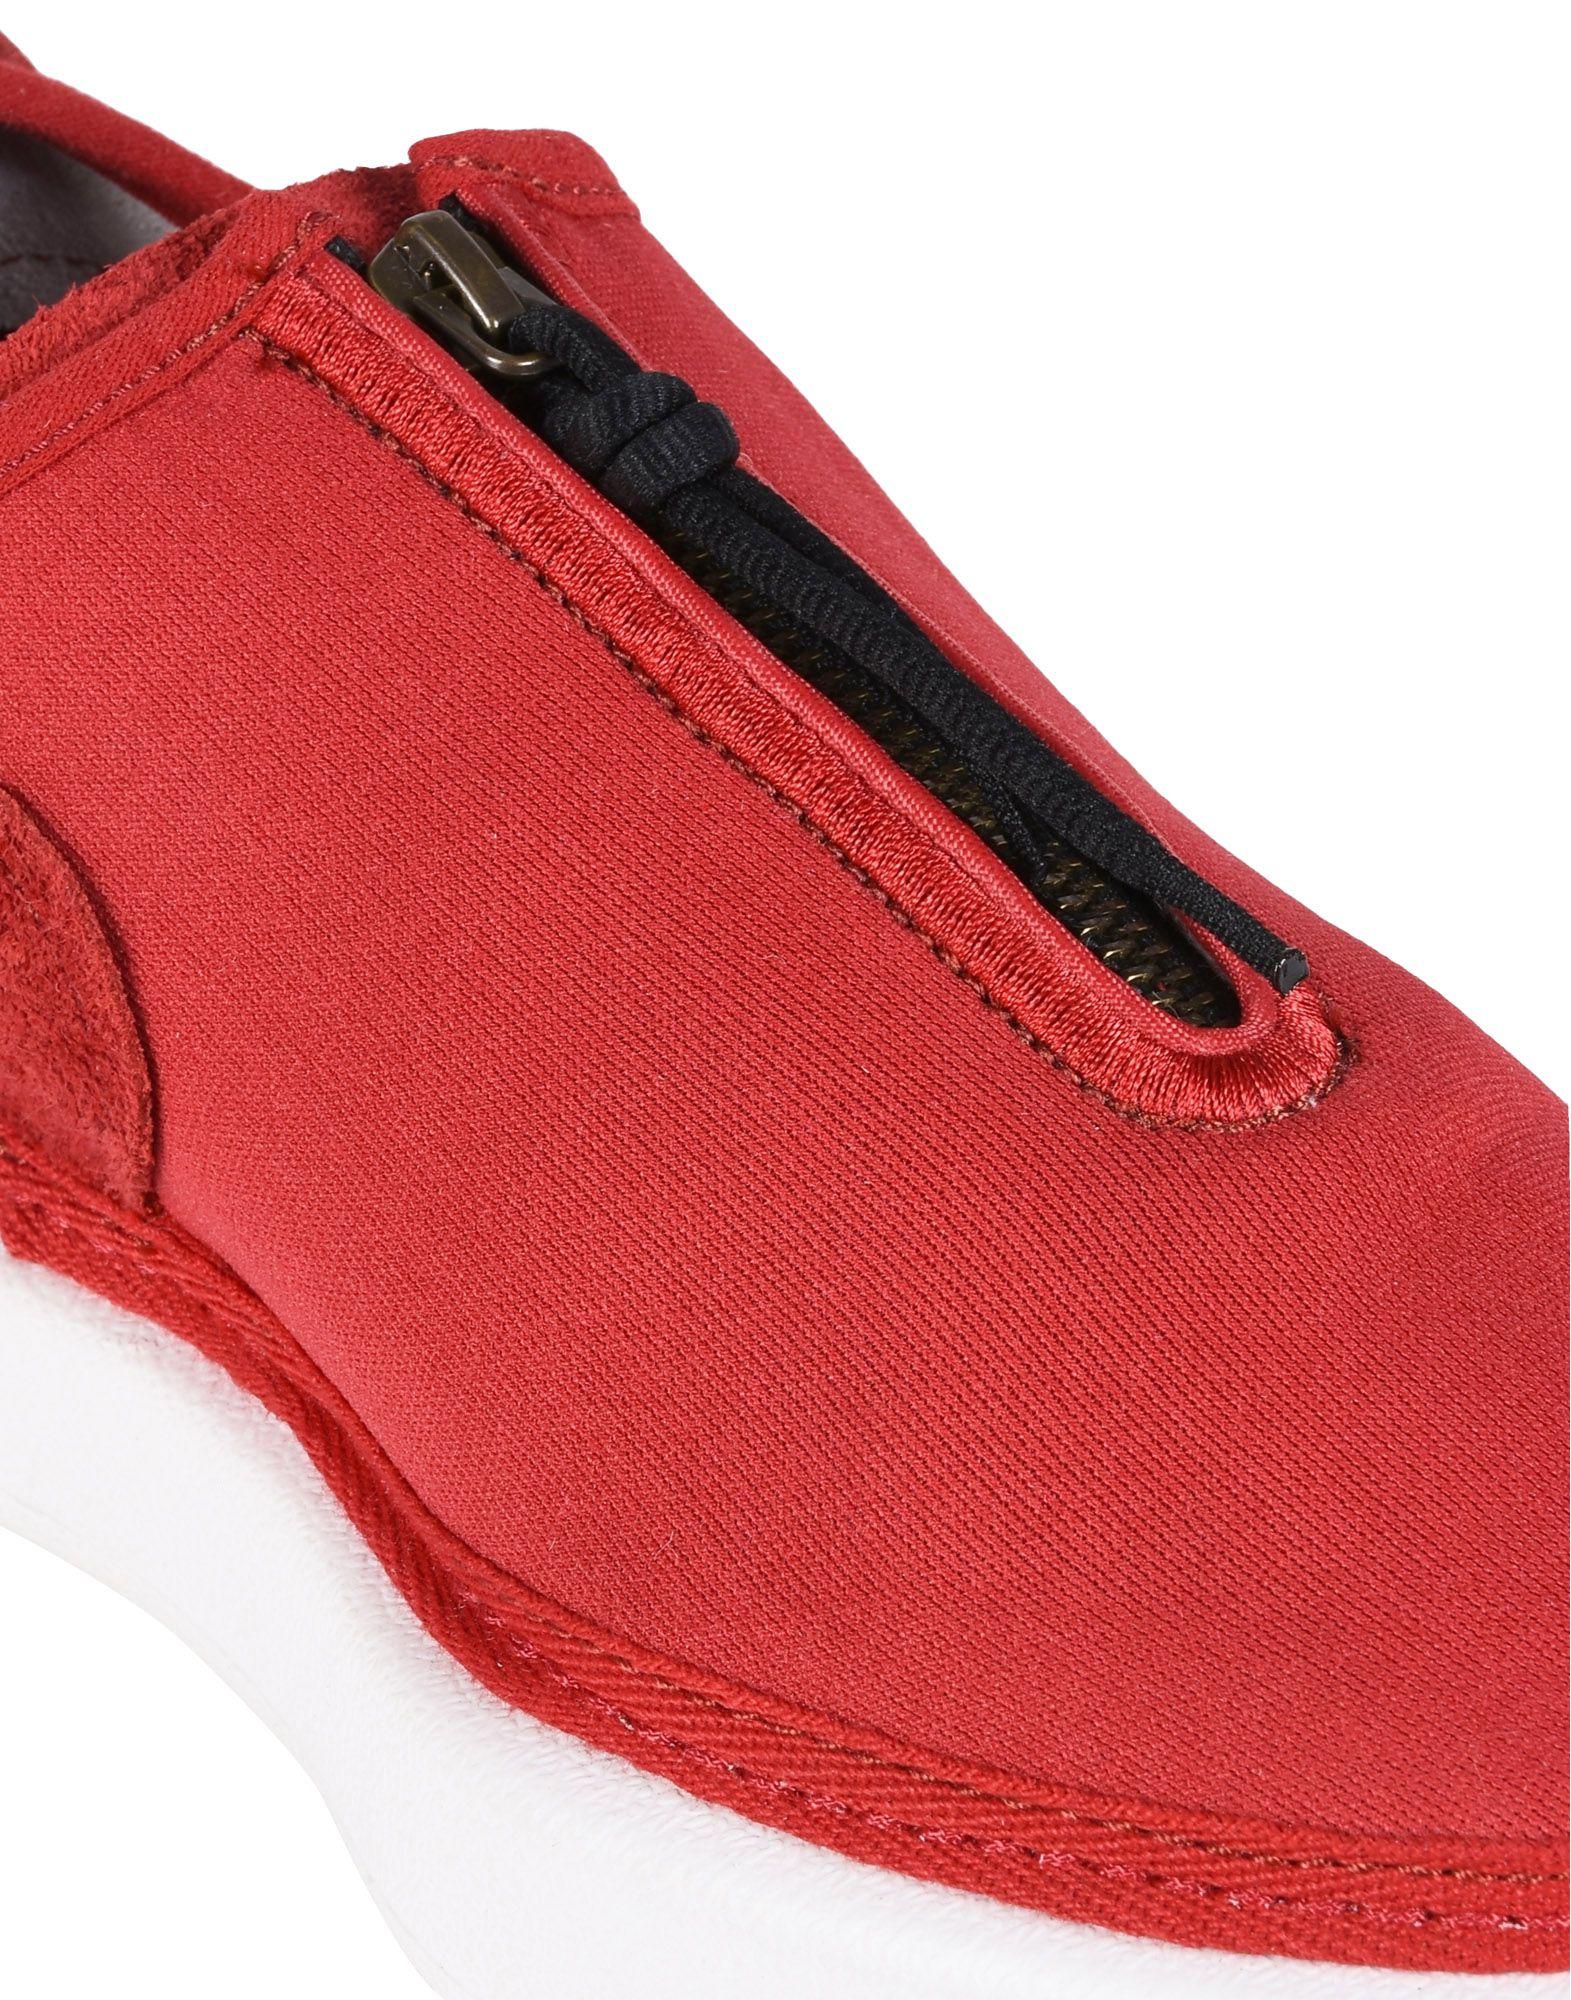 Y-3 Y-3 COMFORT ZIP Sneakers Woman a